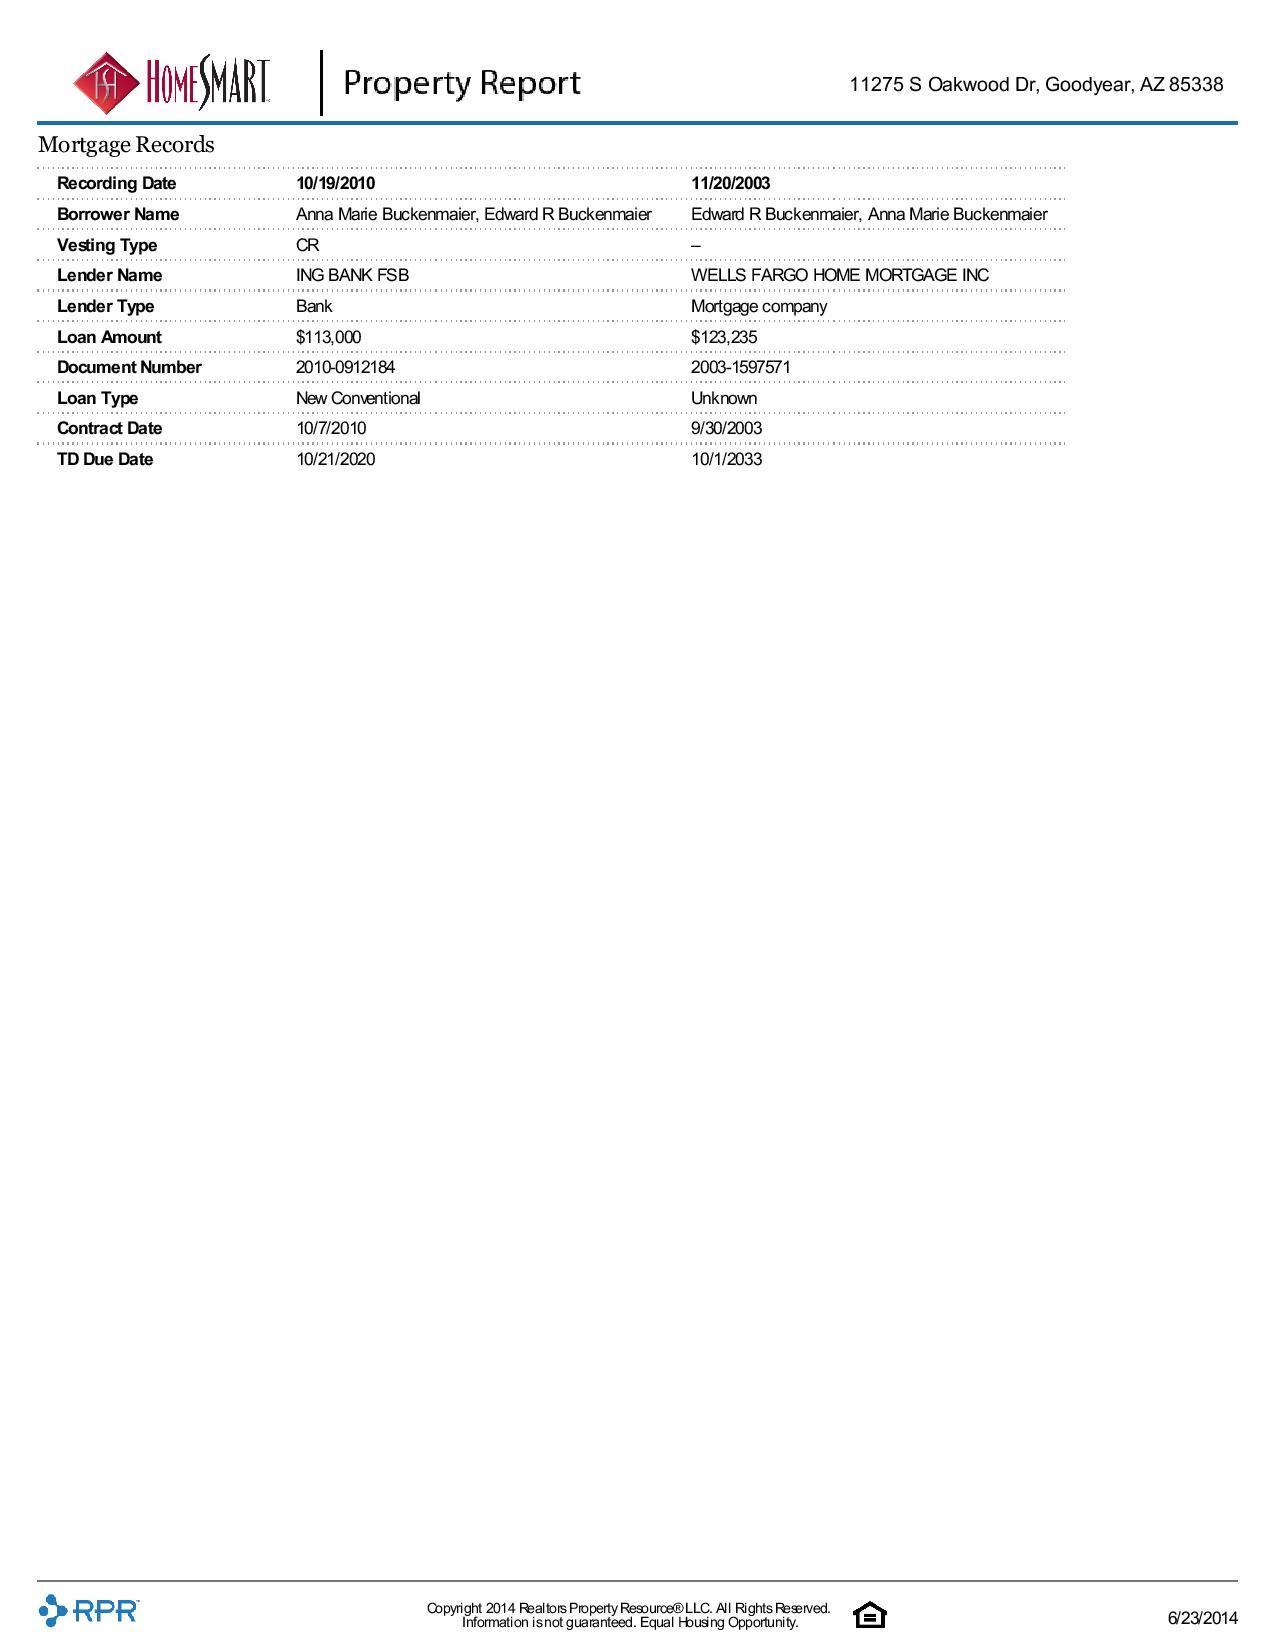 11275-S-Oakwood-Dr-Goodyear-AZ-85338-page-008